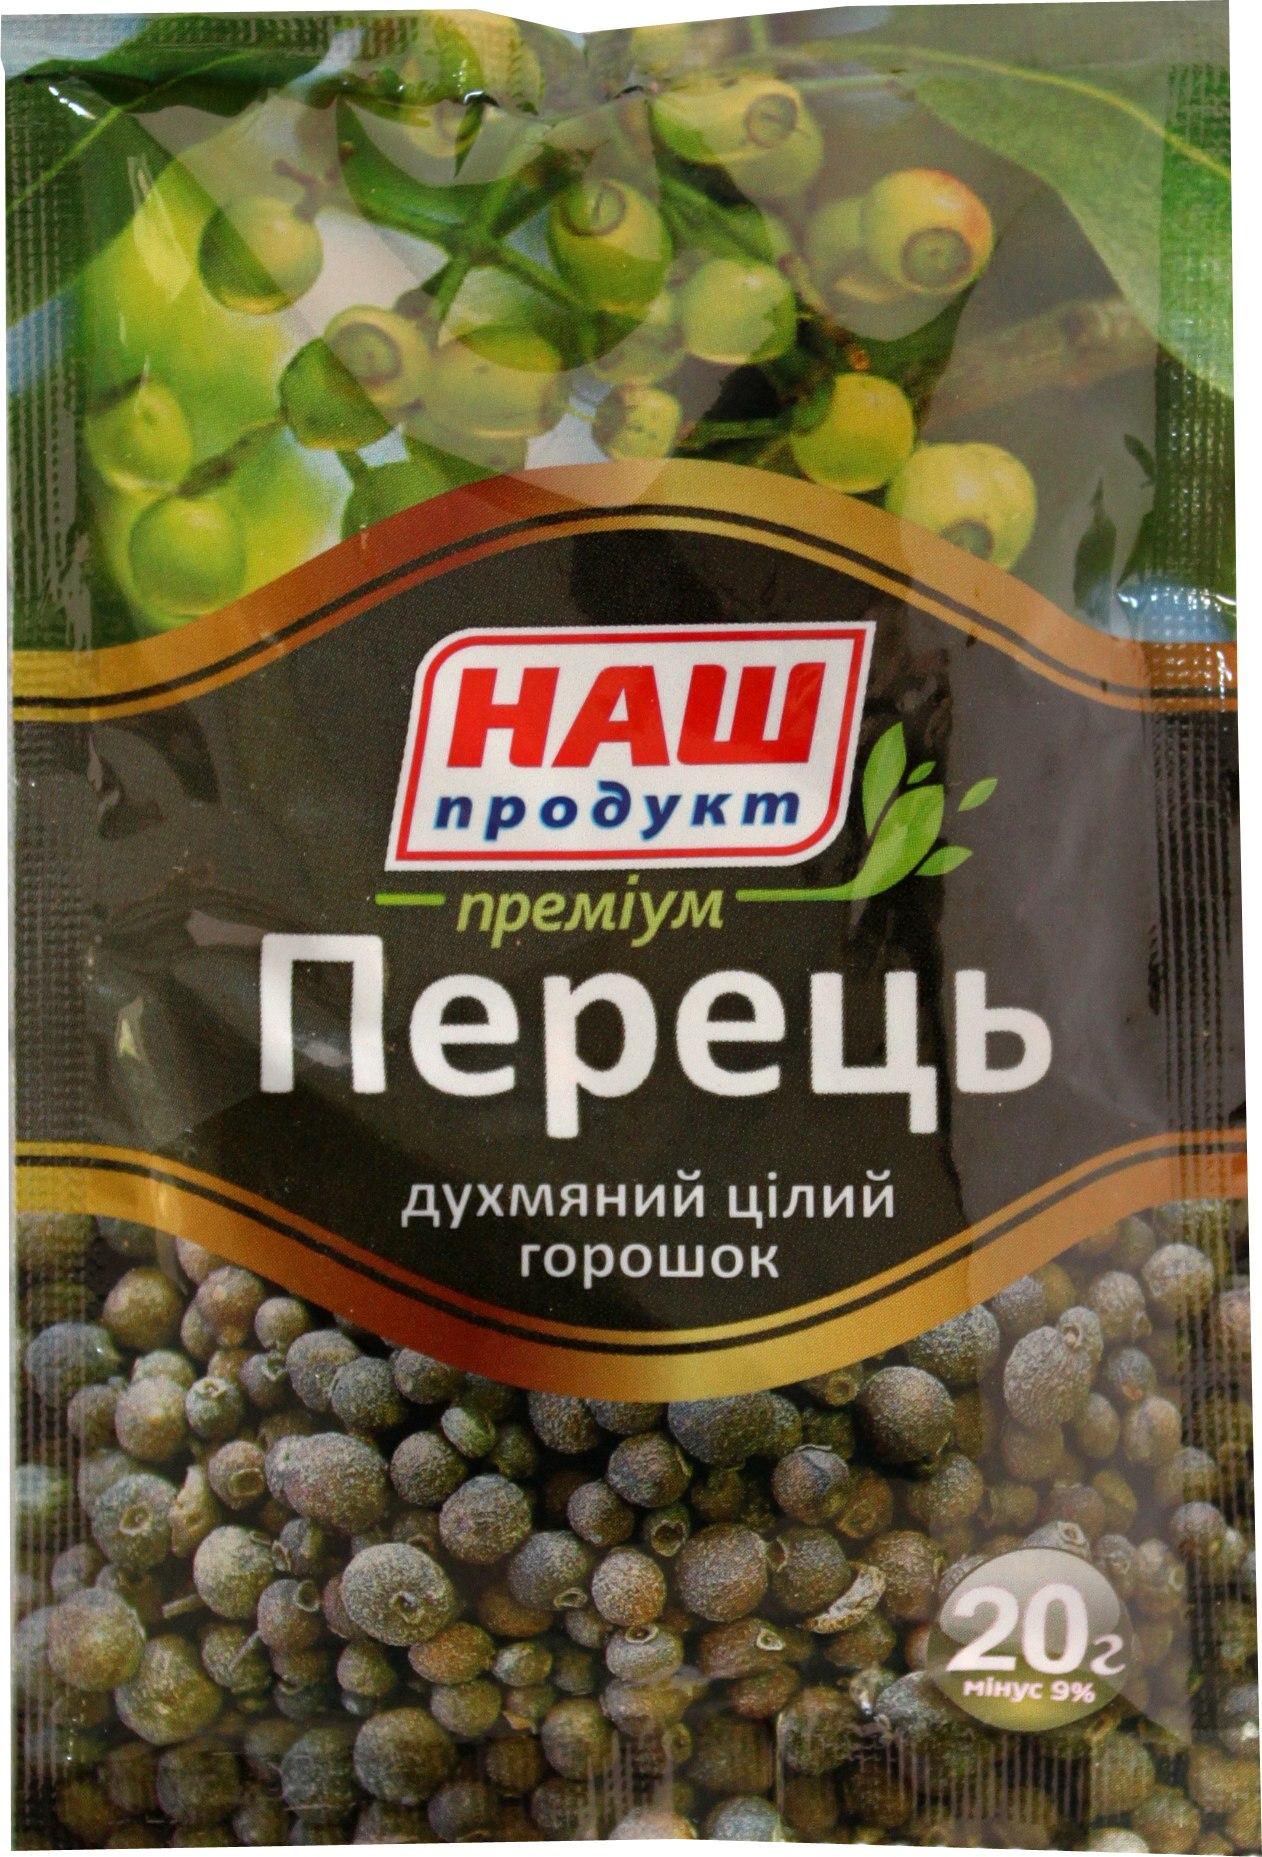 Перець духмяний цілий горошок, Наш Продукт, 20 г